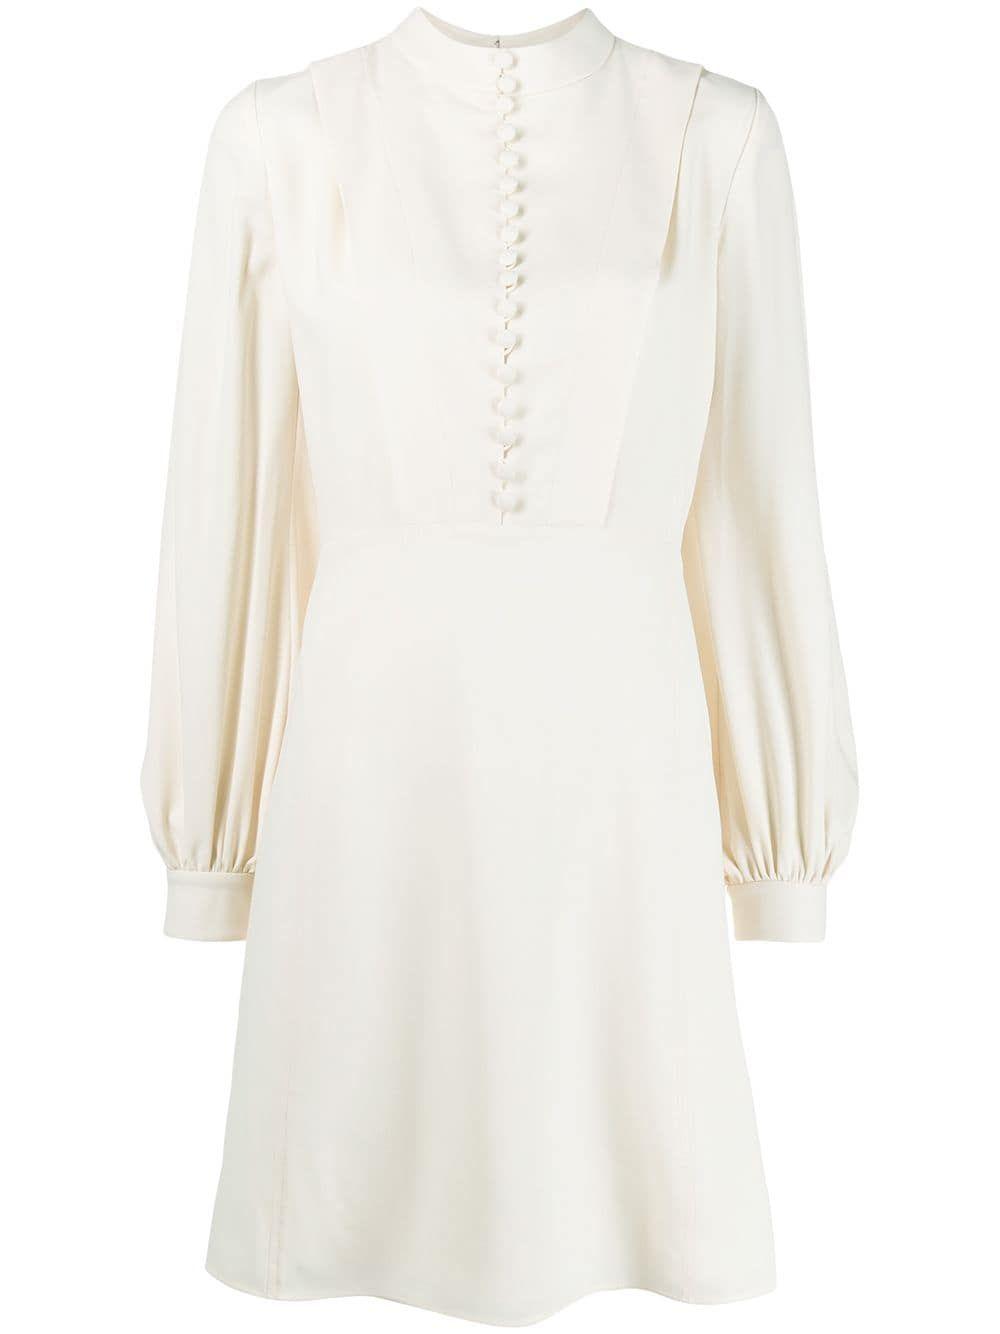 Chloe Buttoned Long Sleeved Dress In White Modesens In 2021 Long Sleeve Dress Dresses White Dress [ 1334 x 1000 Pixel ]